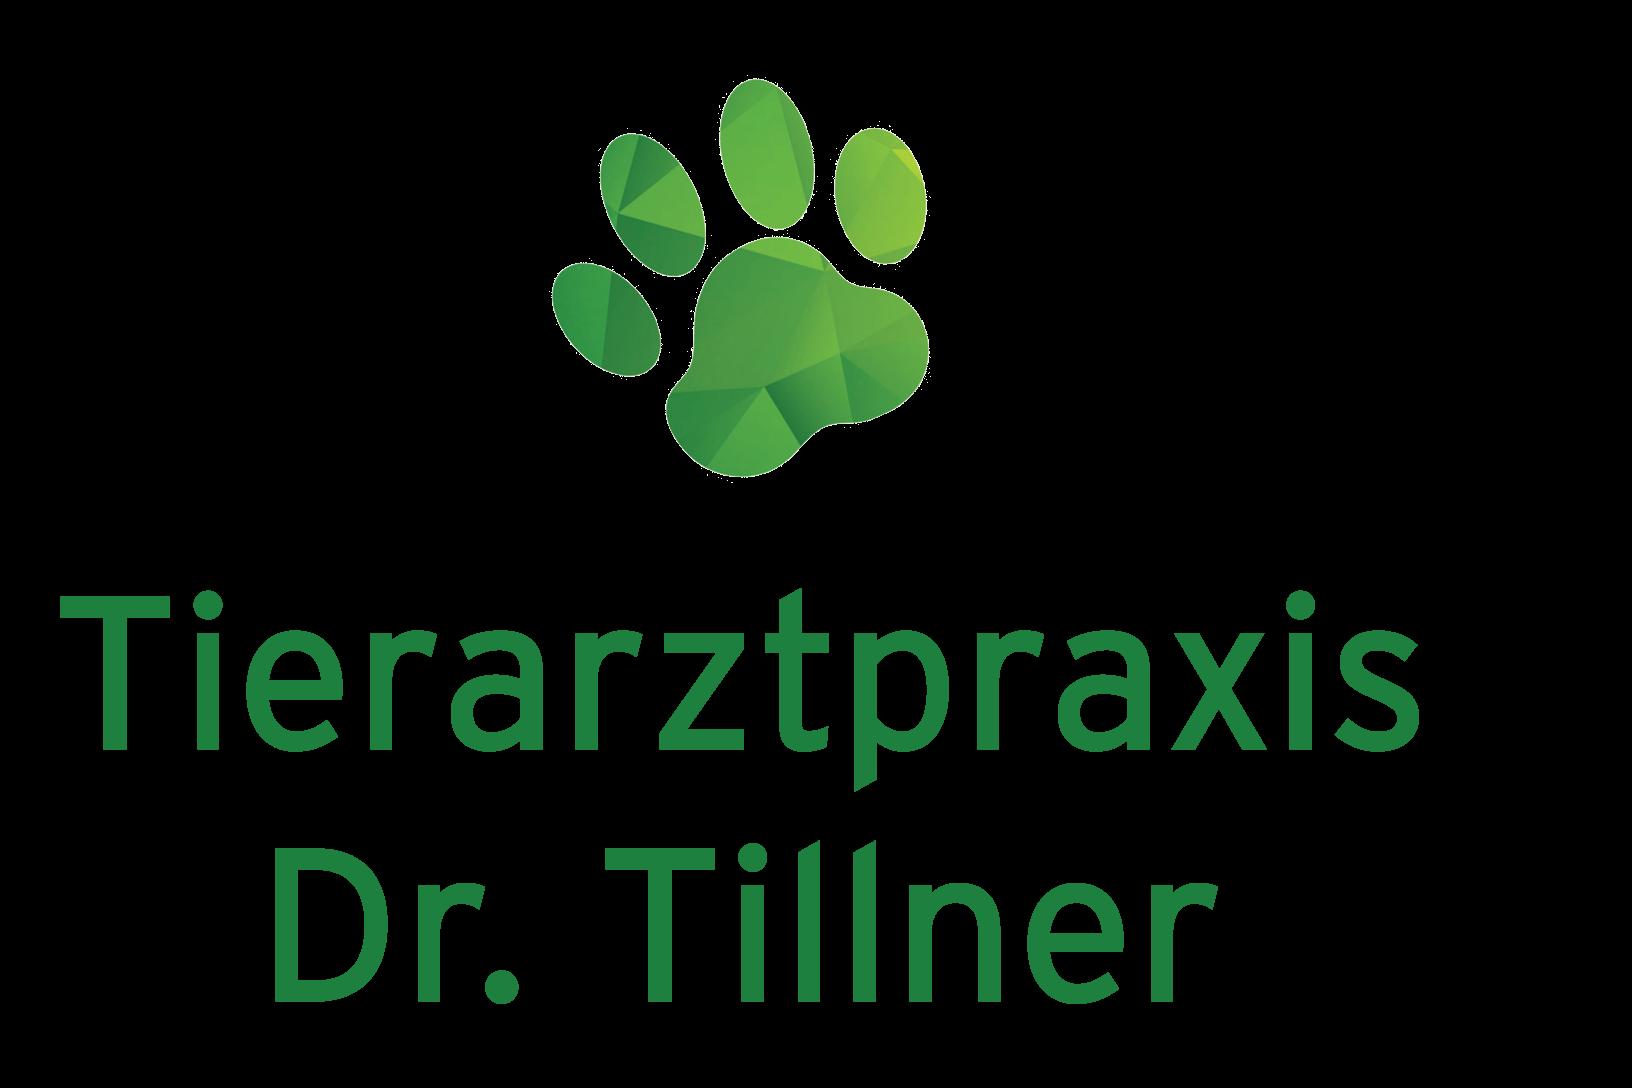 Tierarztpraxis Tillner